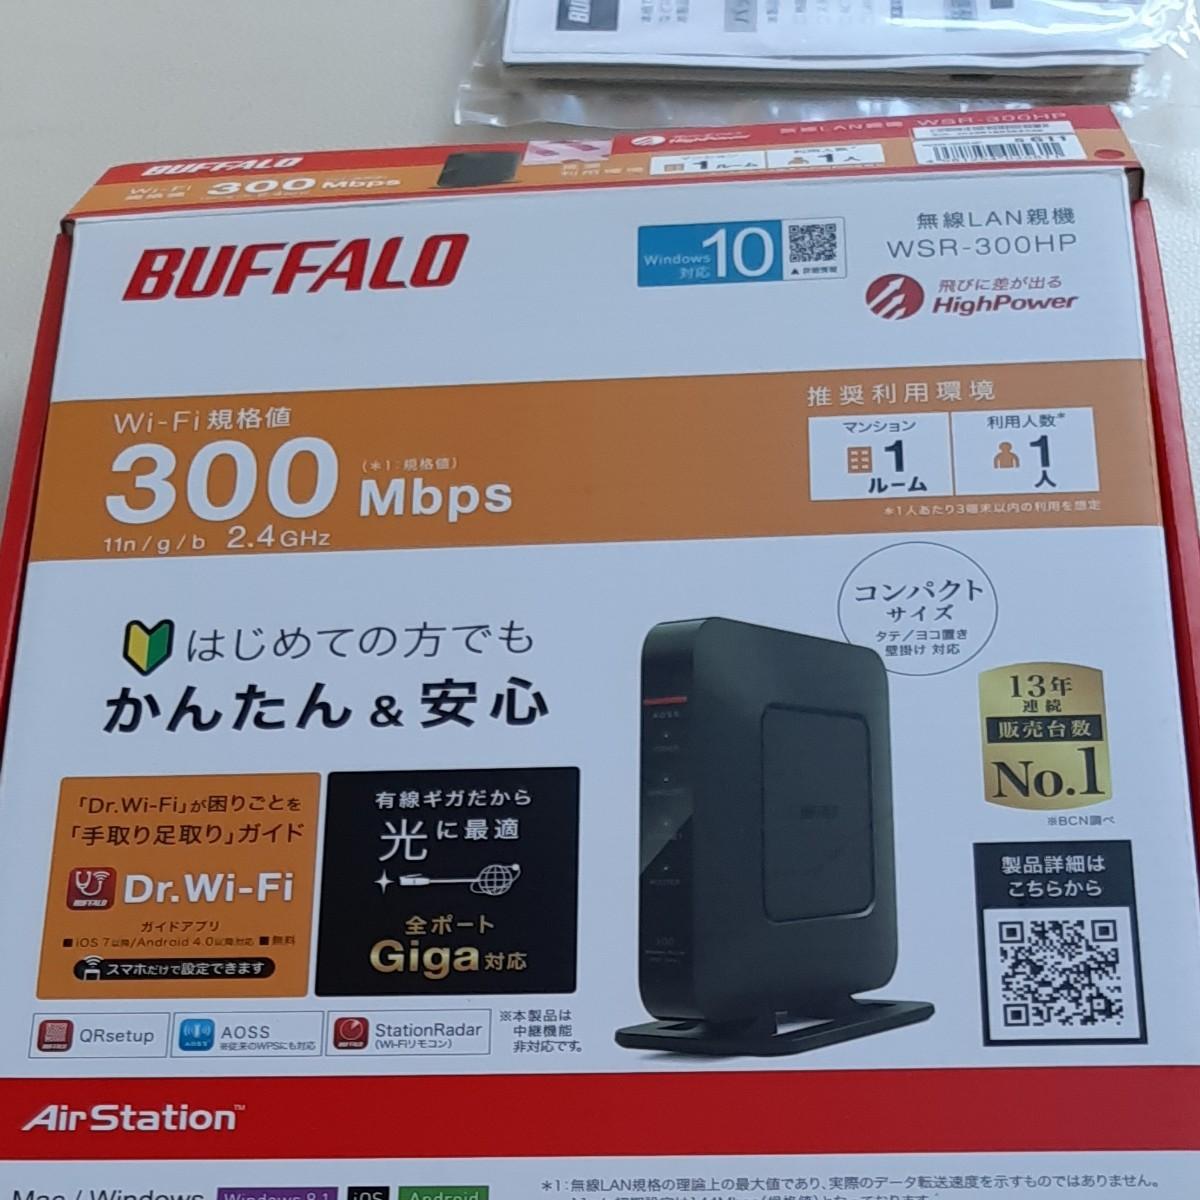 WSR-300HP 無線LAN親機 BUFFALO バッファロー 無線LANルーター Wi-Fi Wi-Fiルーター